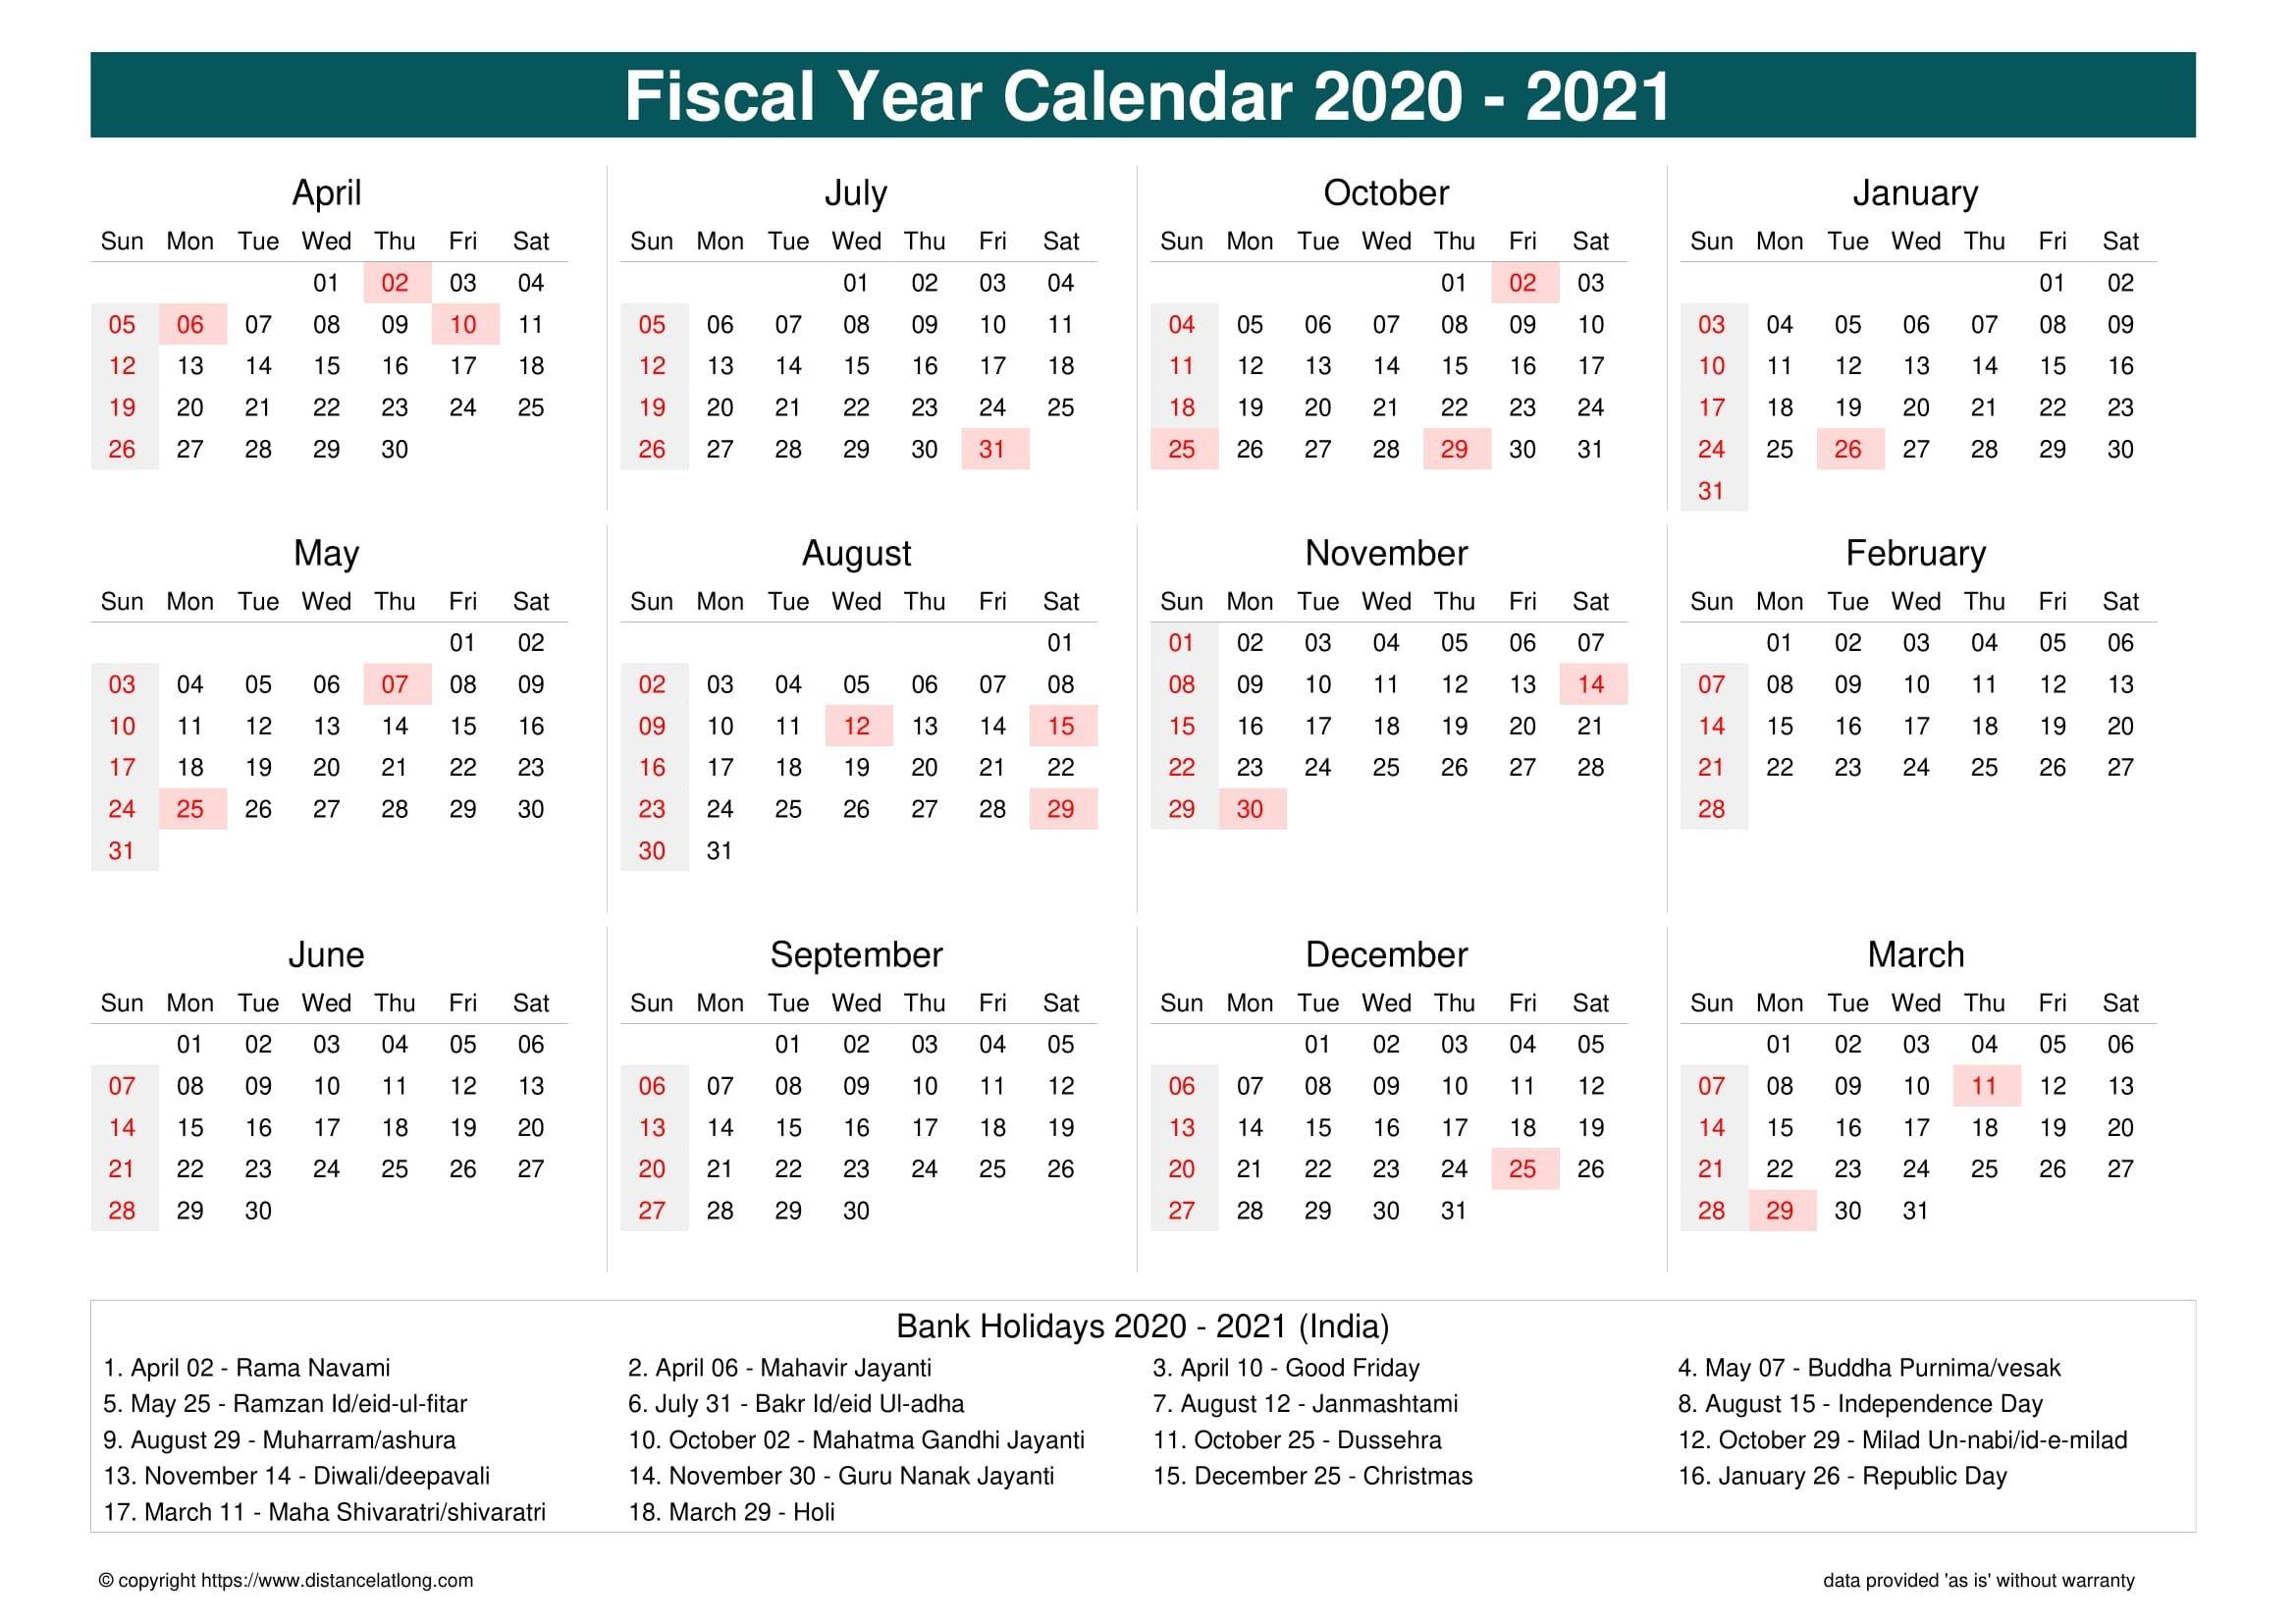 fiscal year 2020 2021 calendar templates, free printable